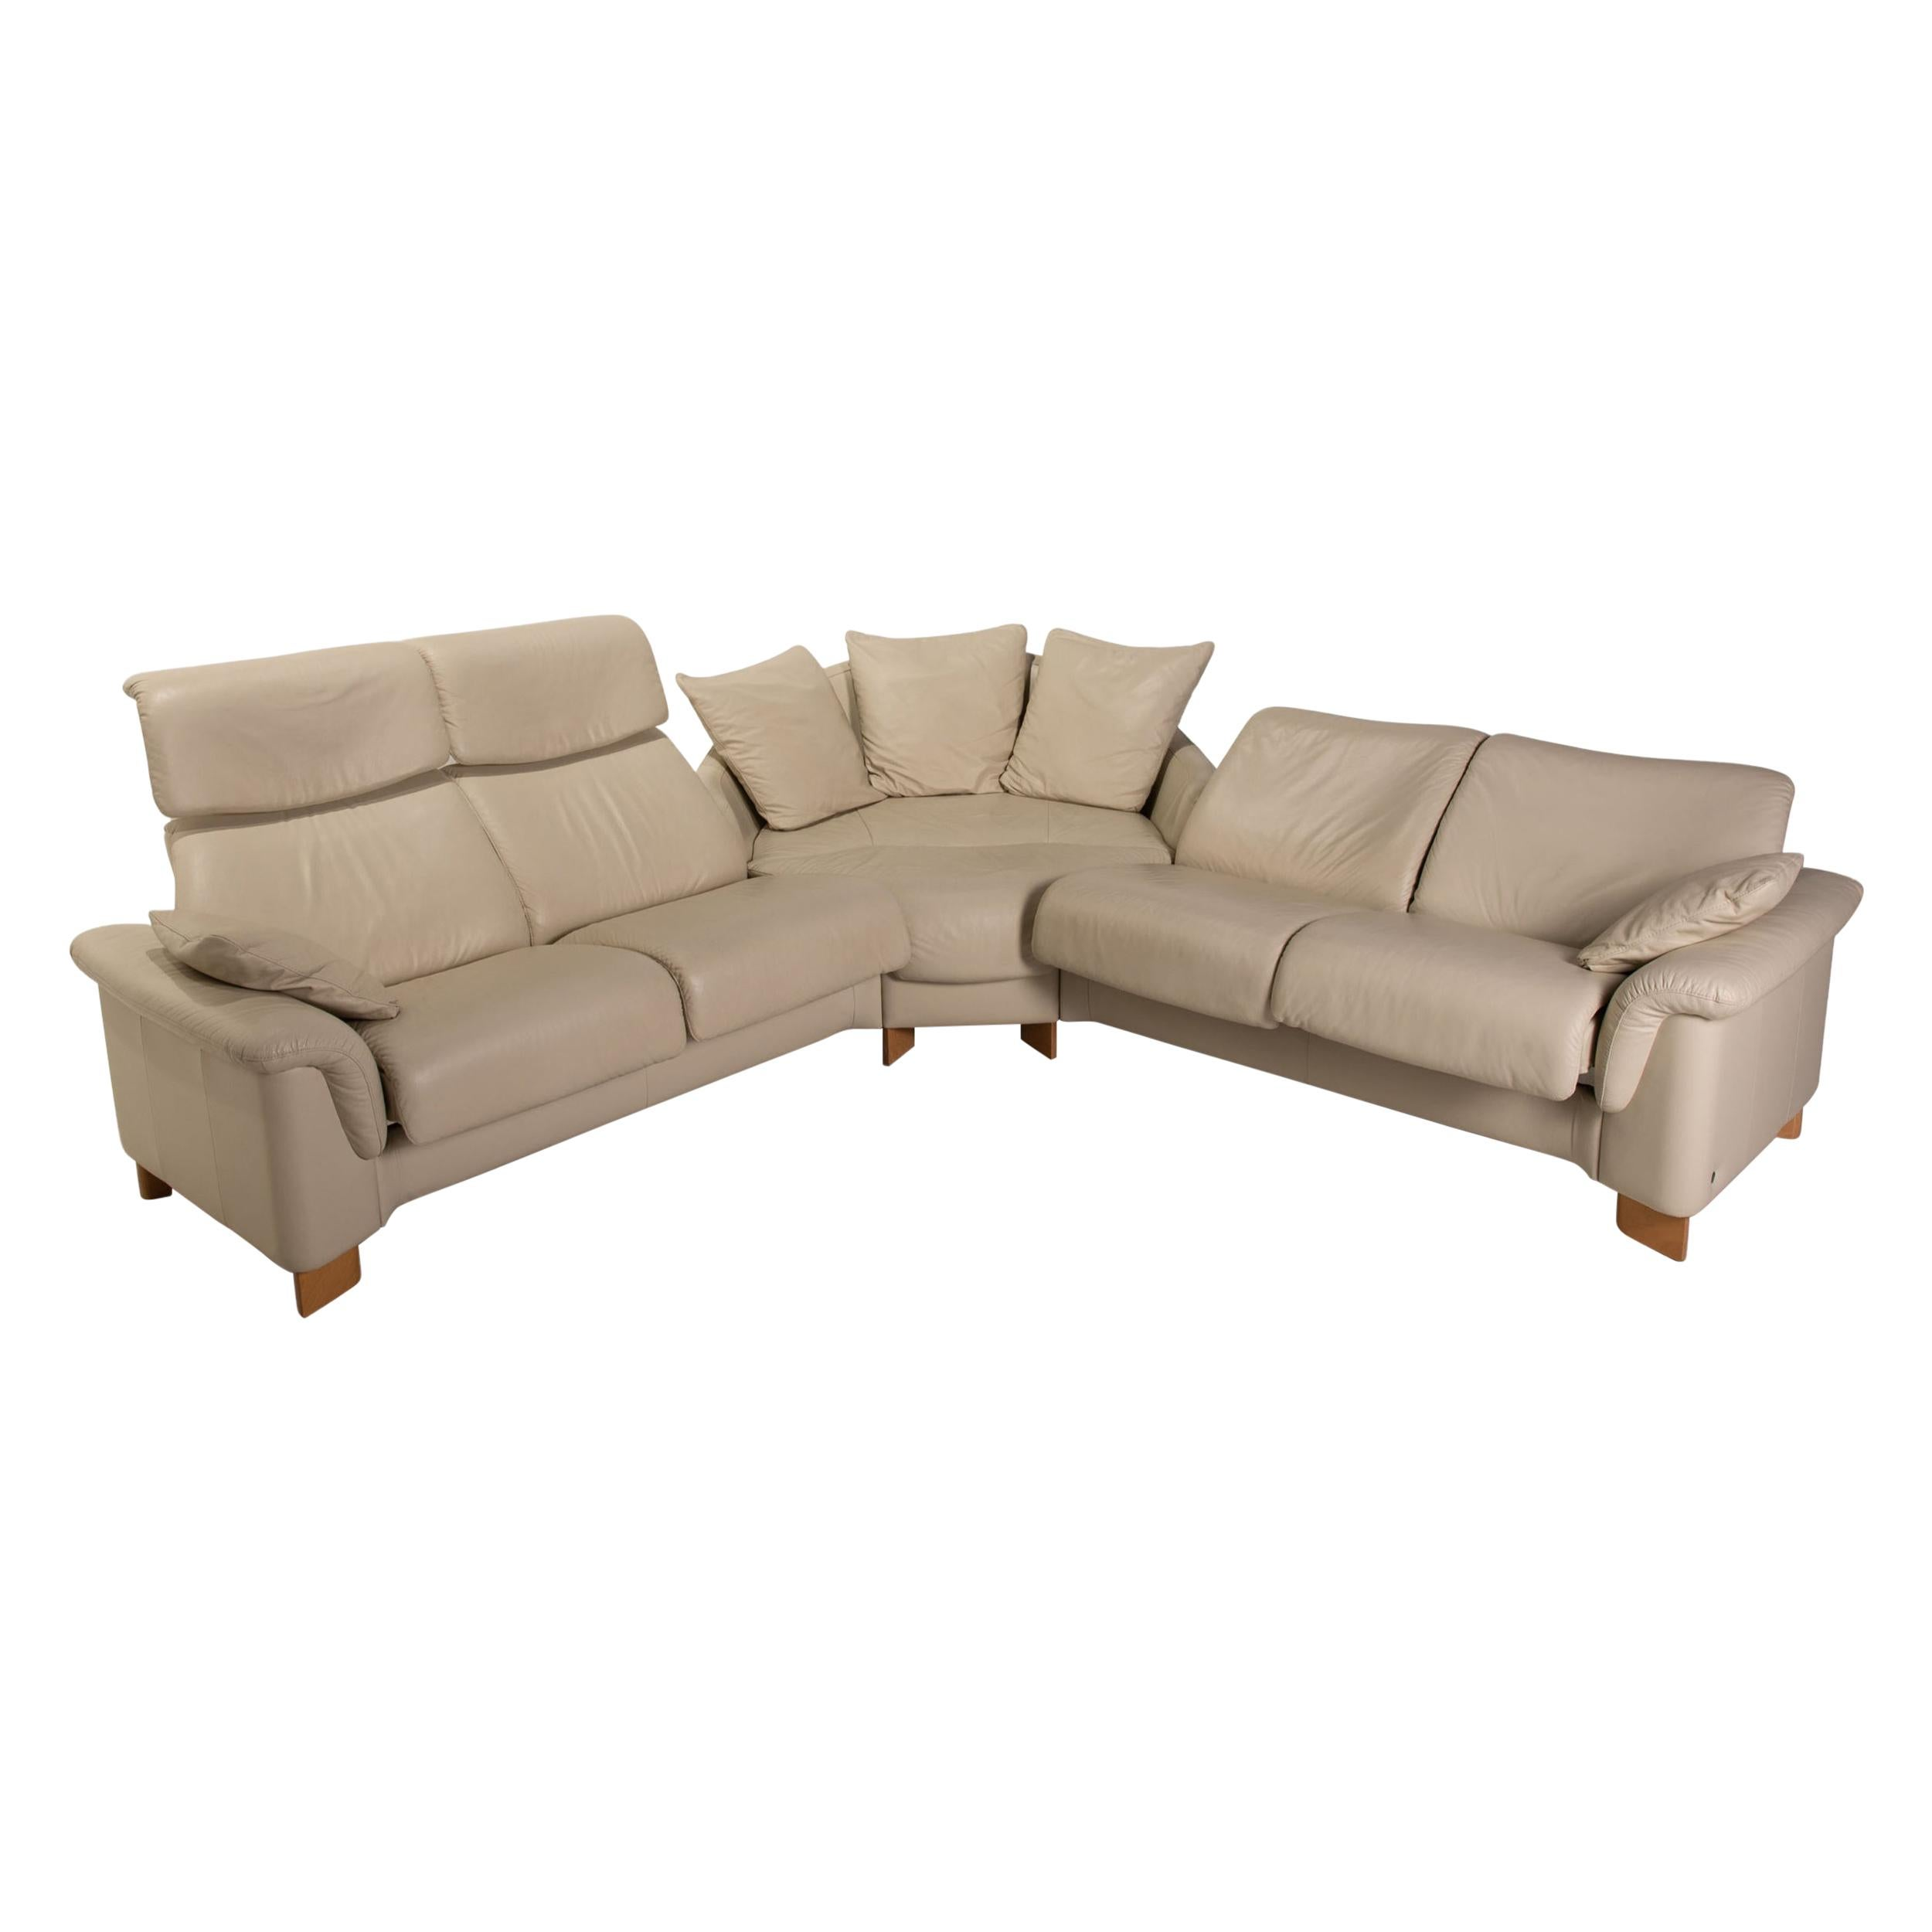 Stressless Paradise Leather Sofa Cream Corner Sofa Couch